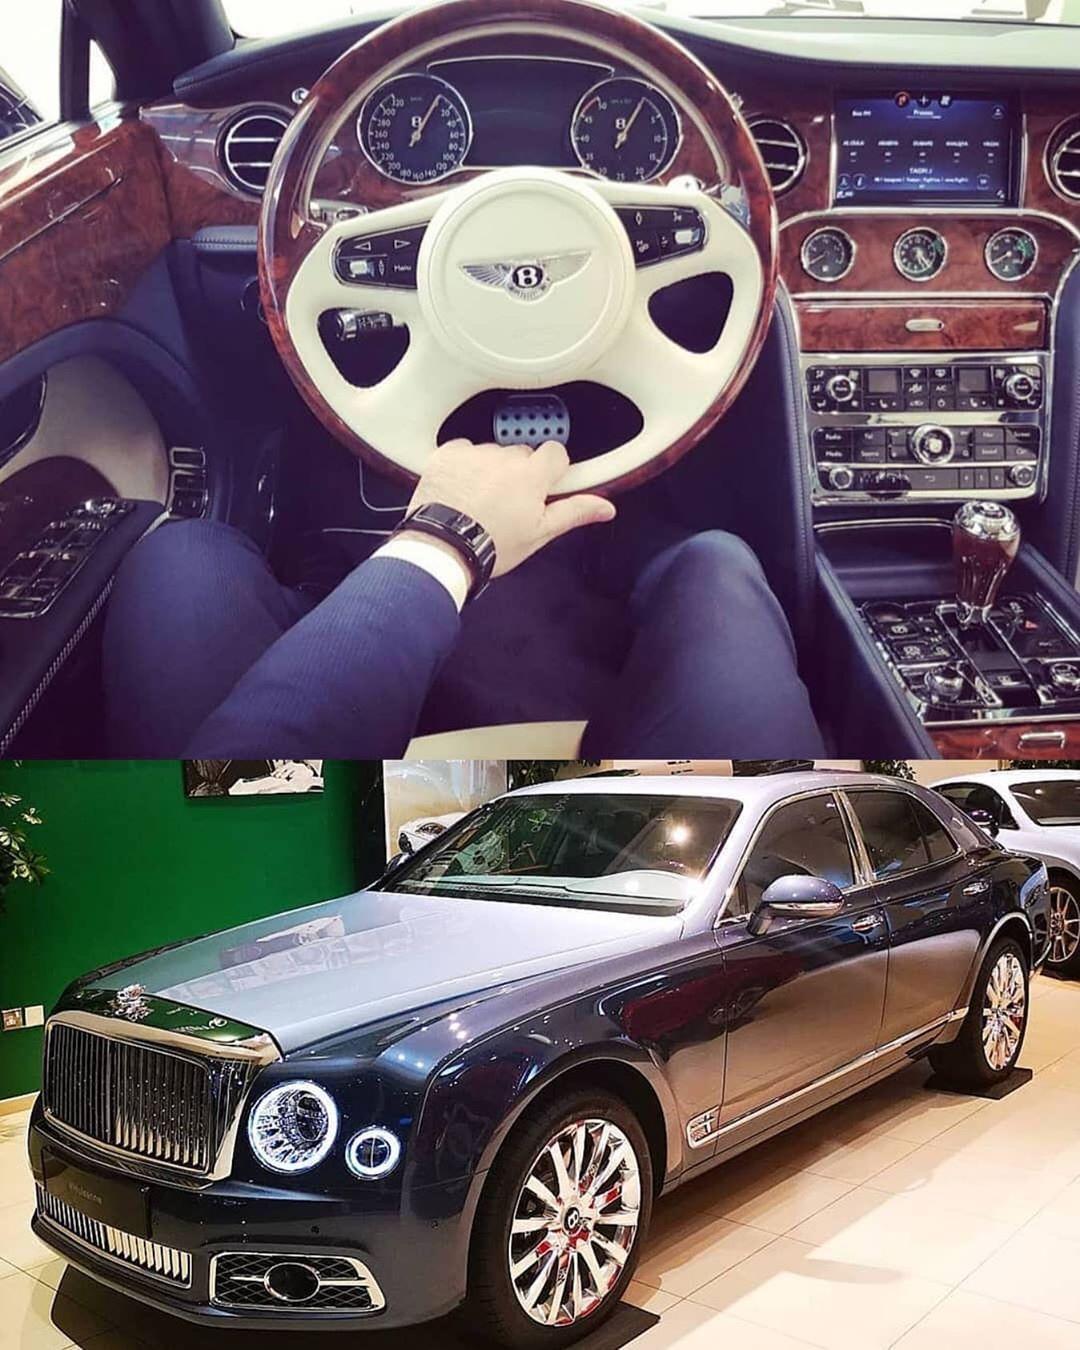 Bentley In 2020 Car Cheap Car Insurance Super Cars